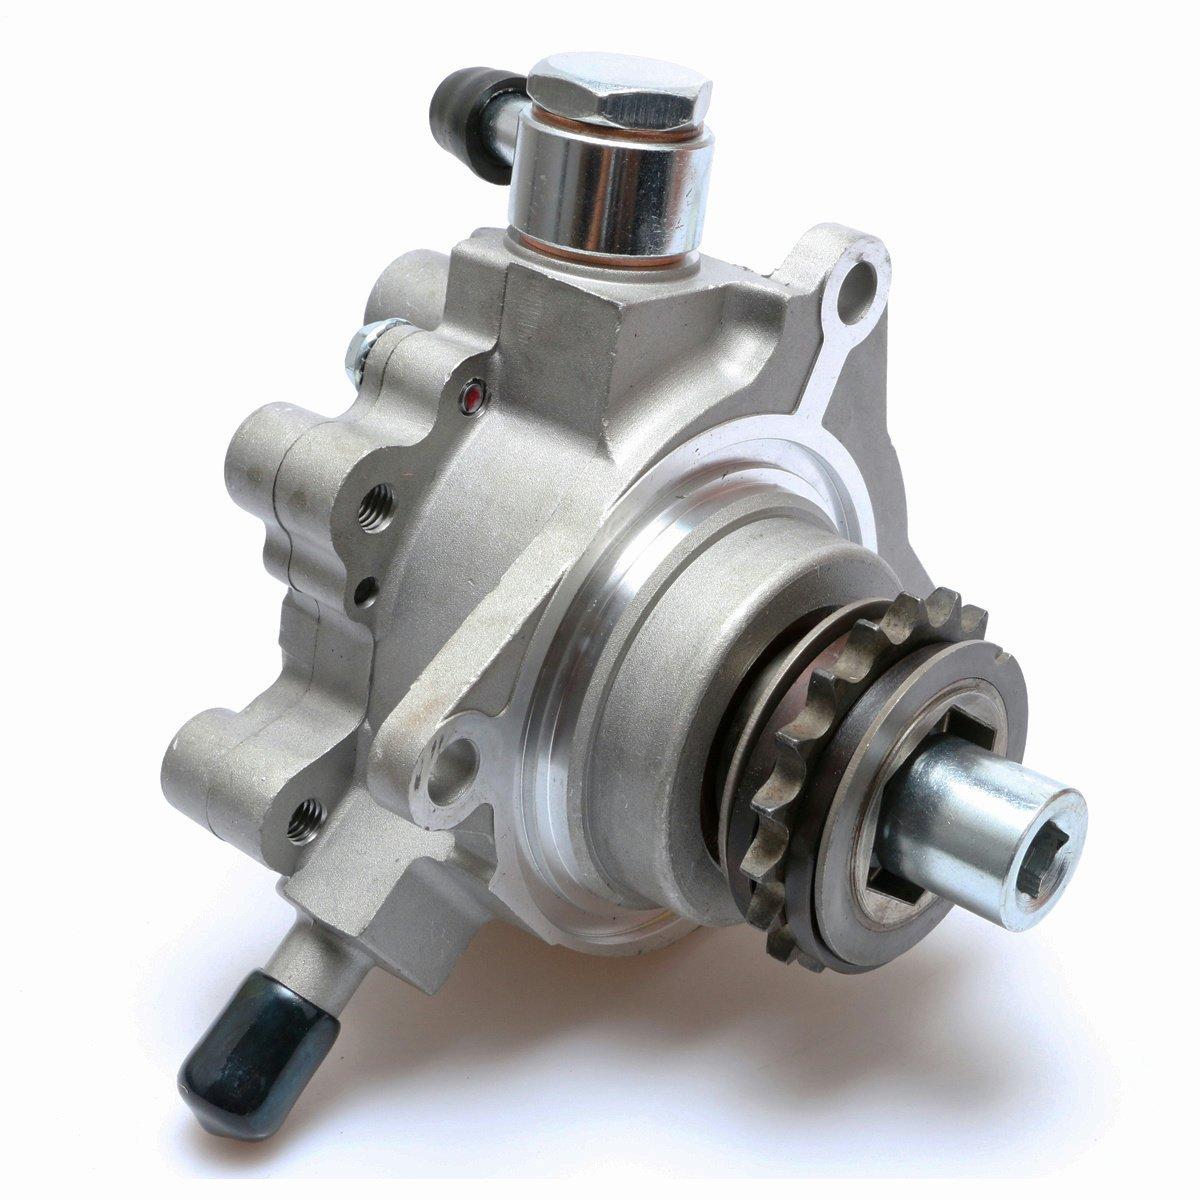 Brake Vacuum Pump For Nissan Navara D40 Pathfinder R51 2.5L YD25DDTI 2005-14